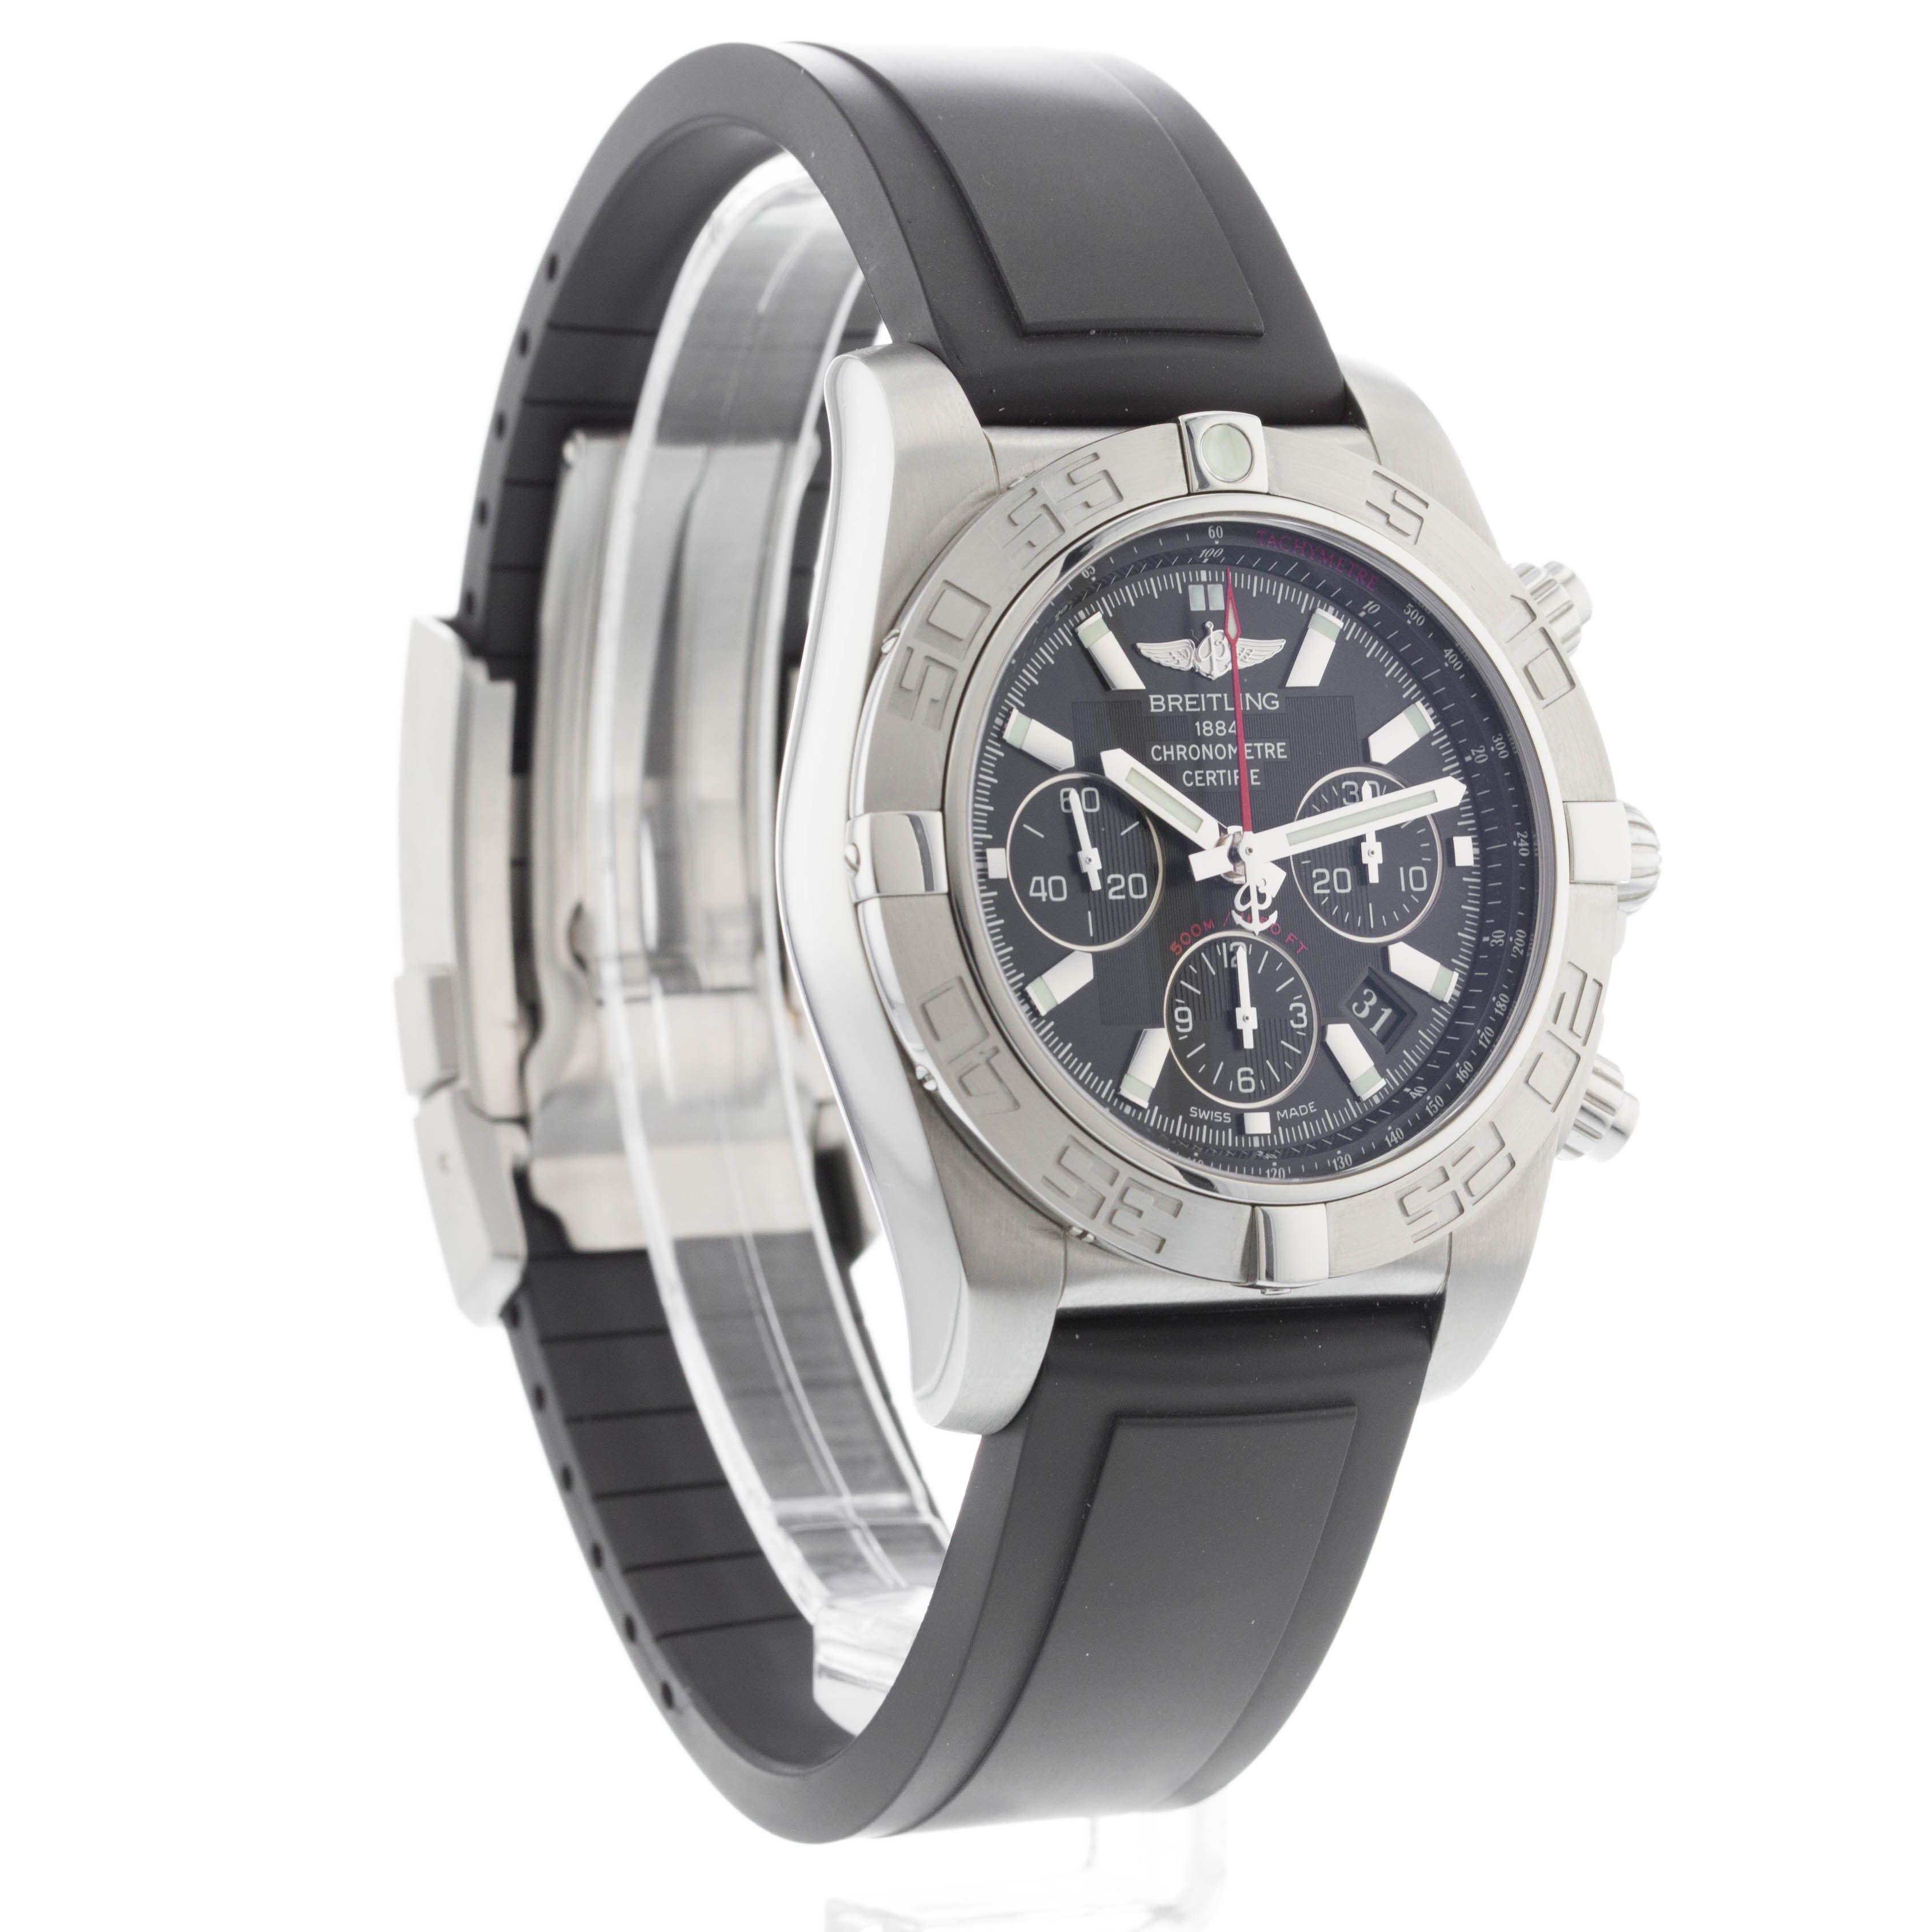 Used Breitling Watches >> Chronomat C C Breitling Watches Breitling Chronomat Breitling